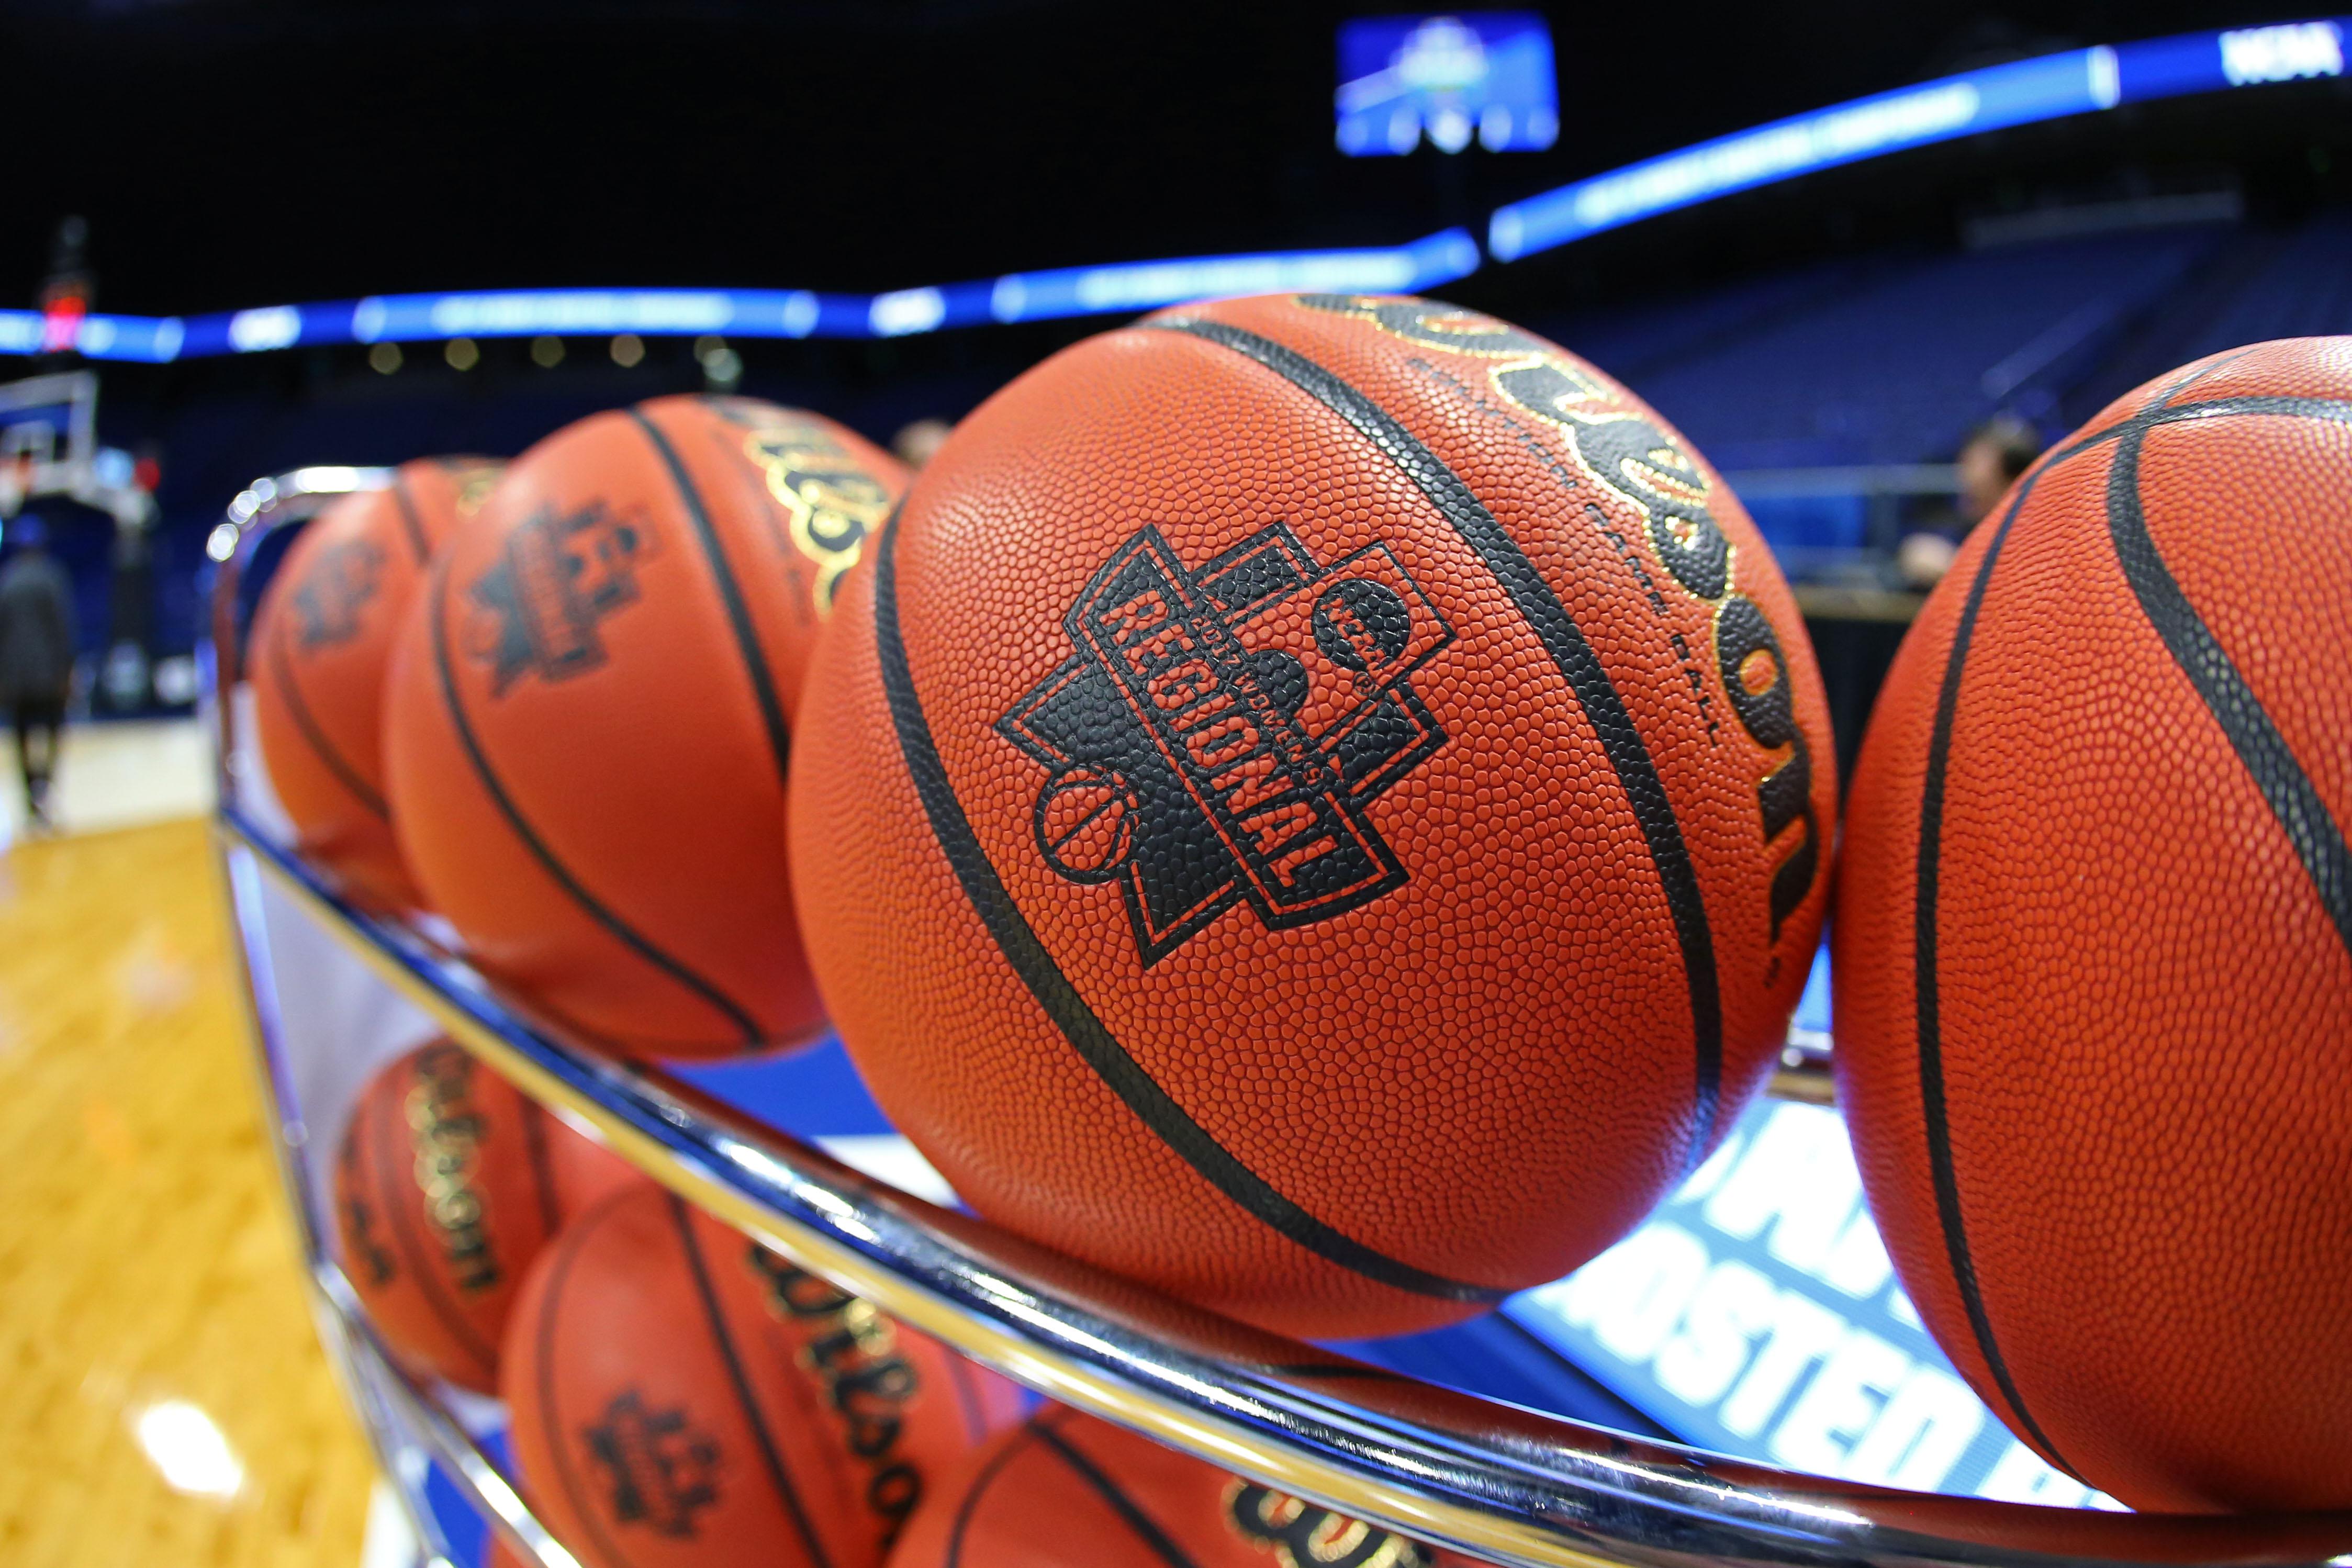 Updated NCAA Women's Tournament bracket: Stanford advances to Final Four